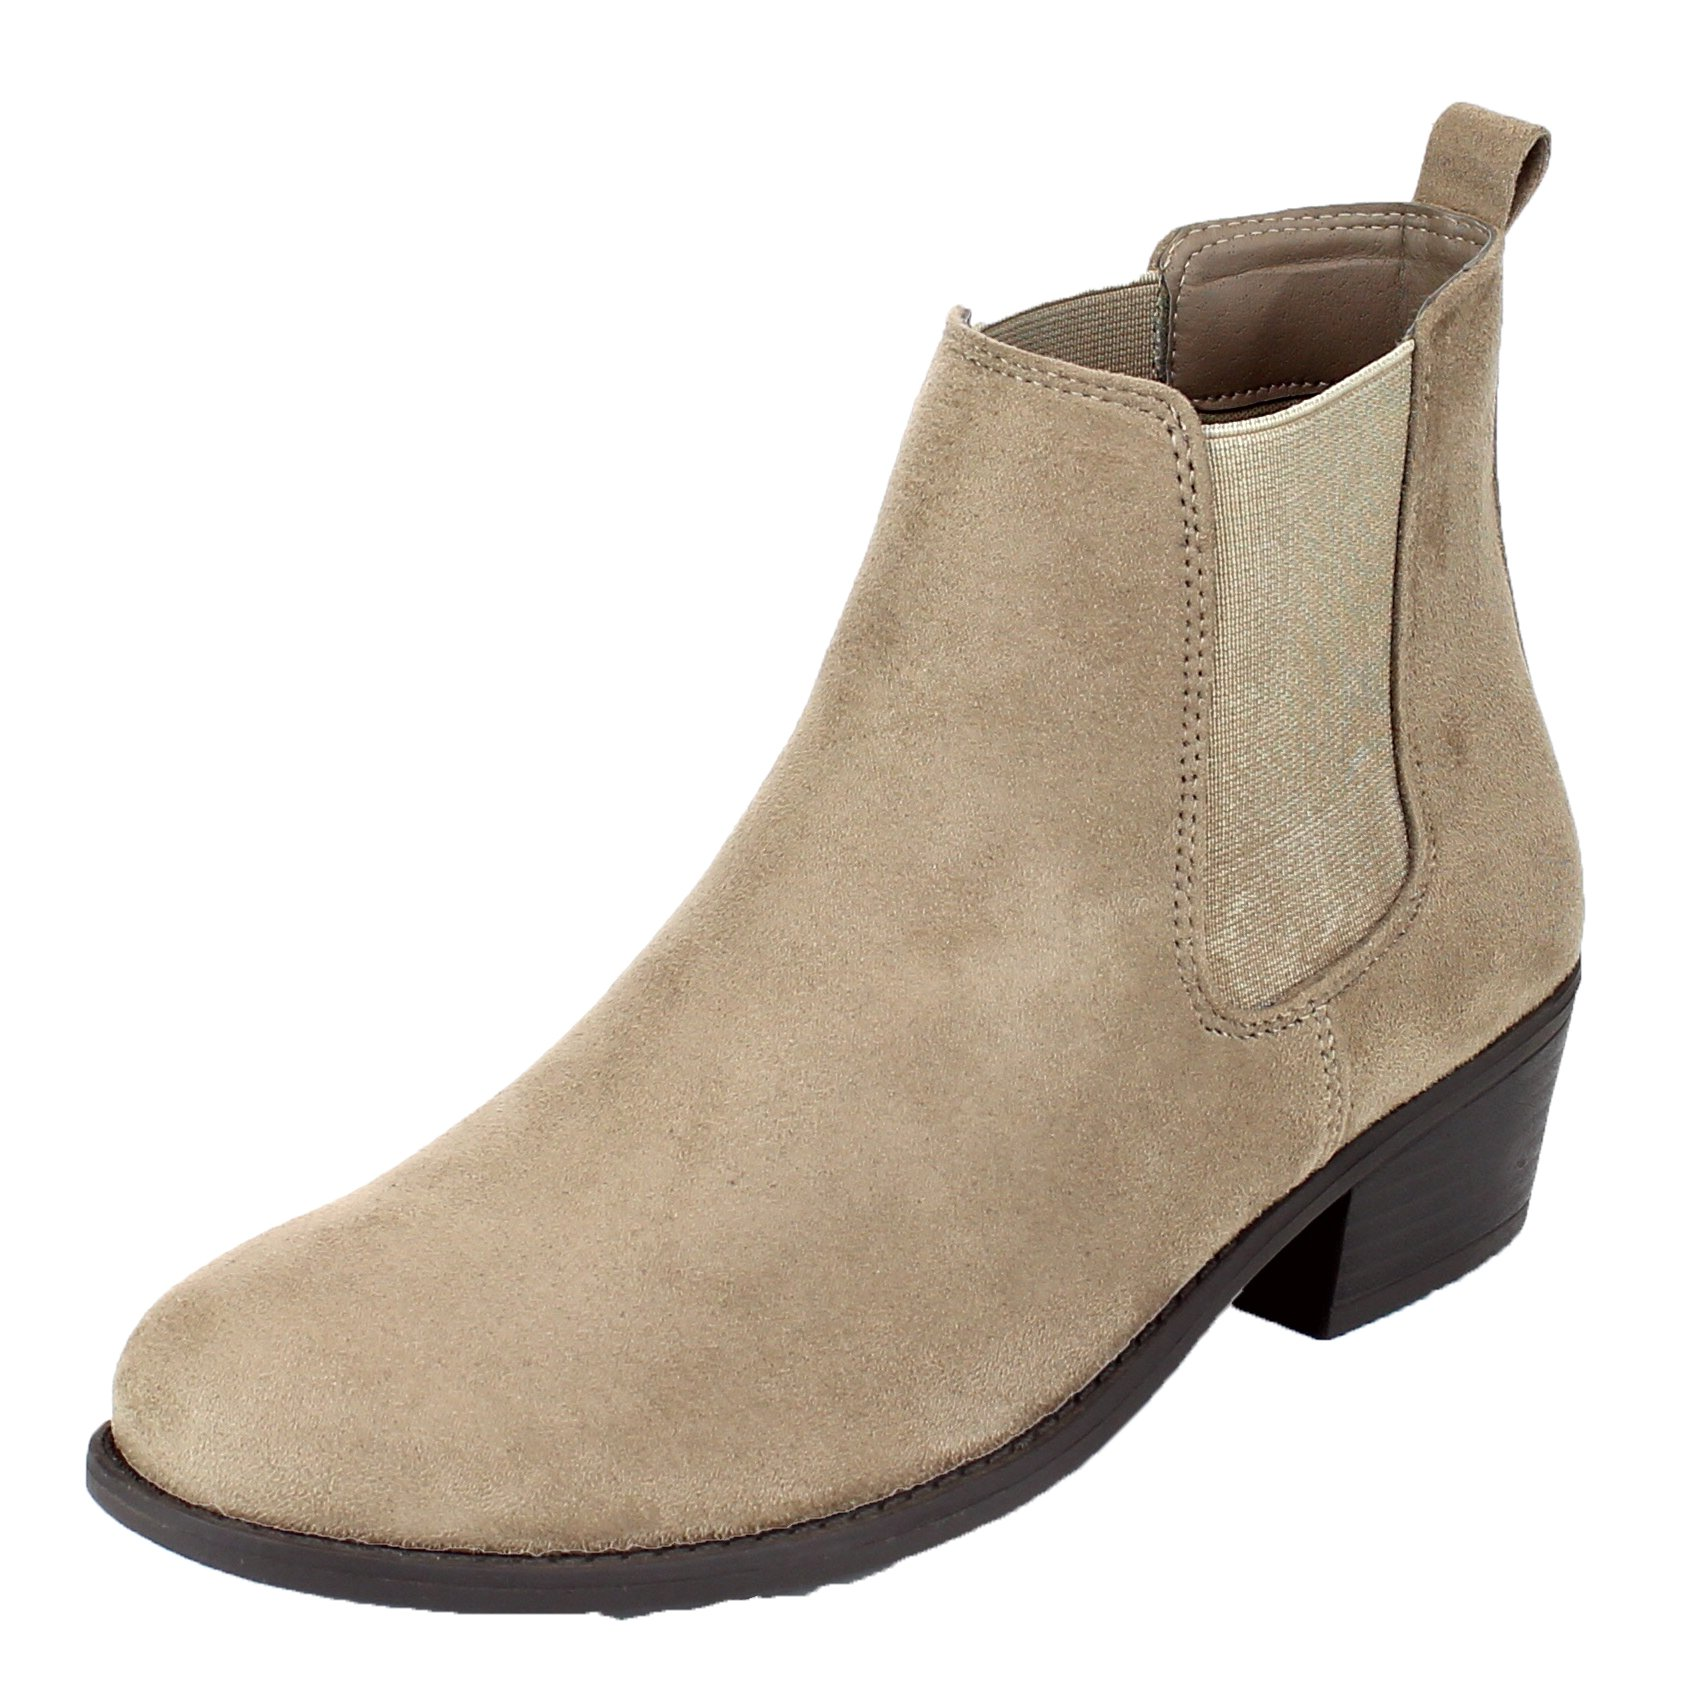 Refresh Women's Tildon-03 Ankle Boot, Taupe 7 B(M) US